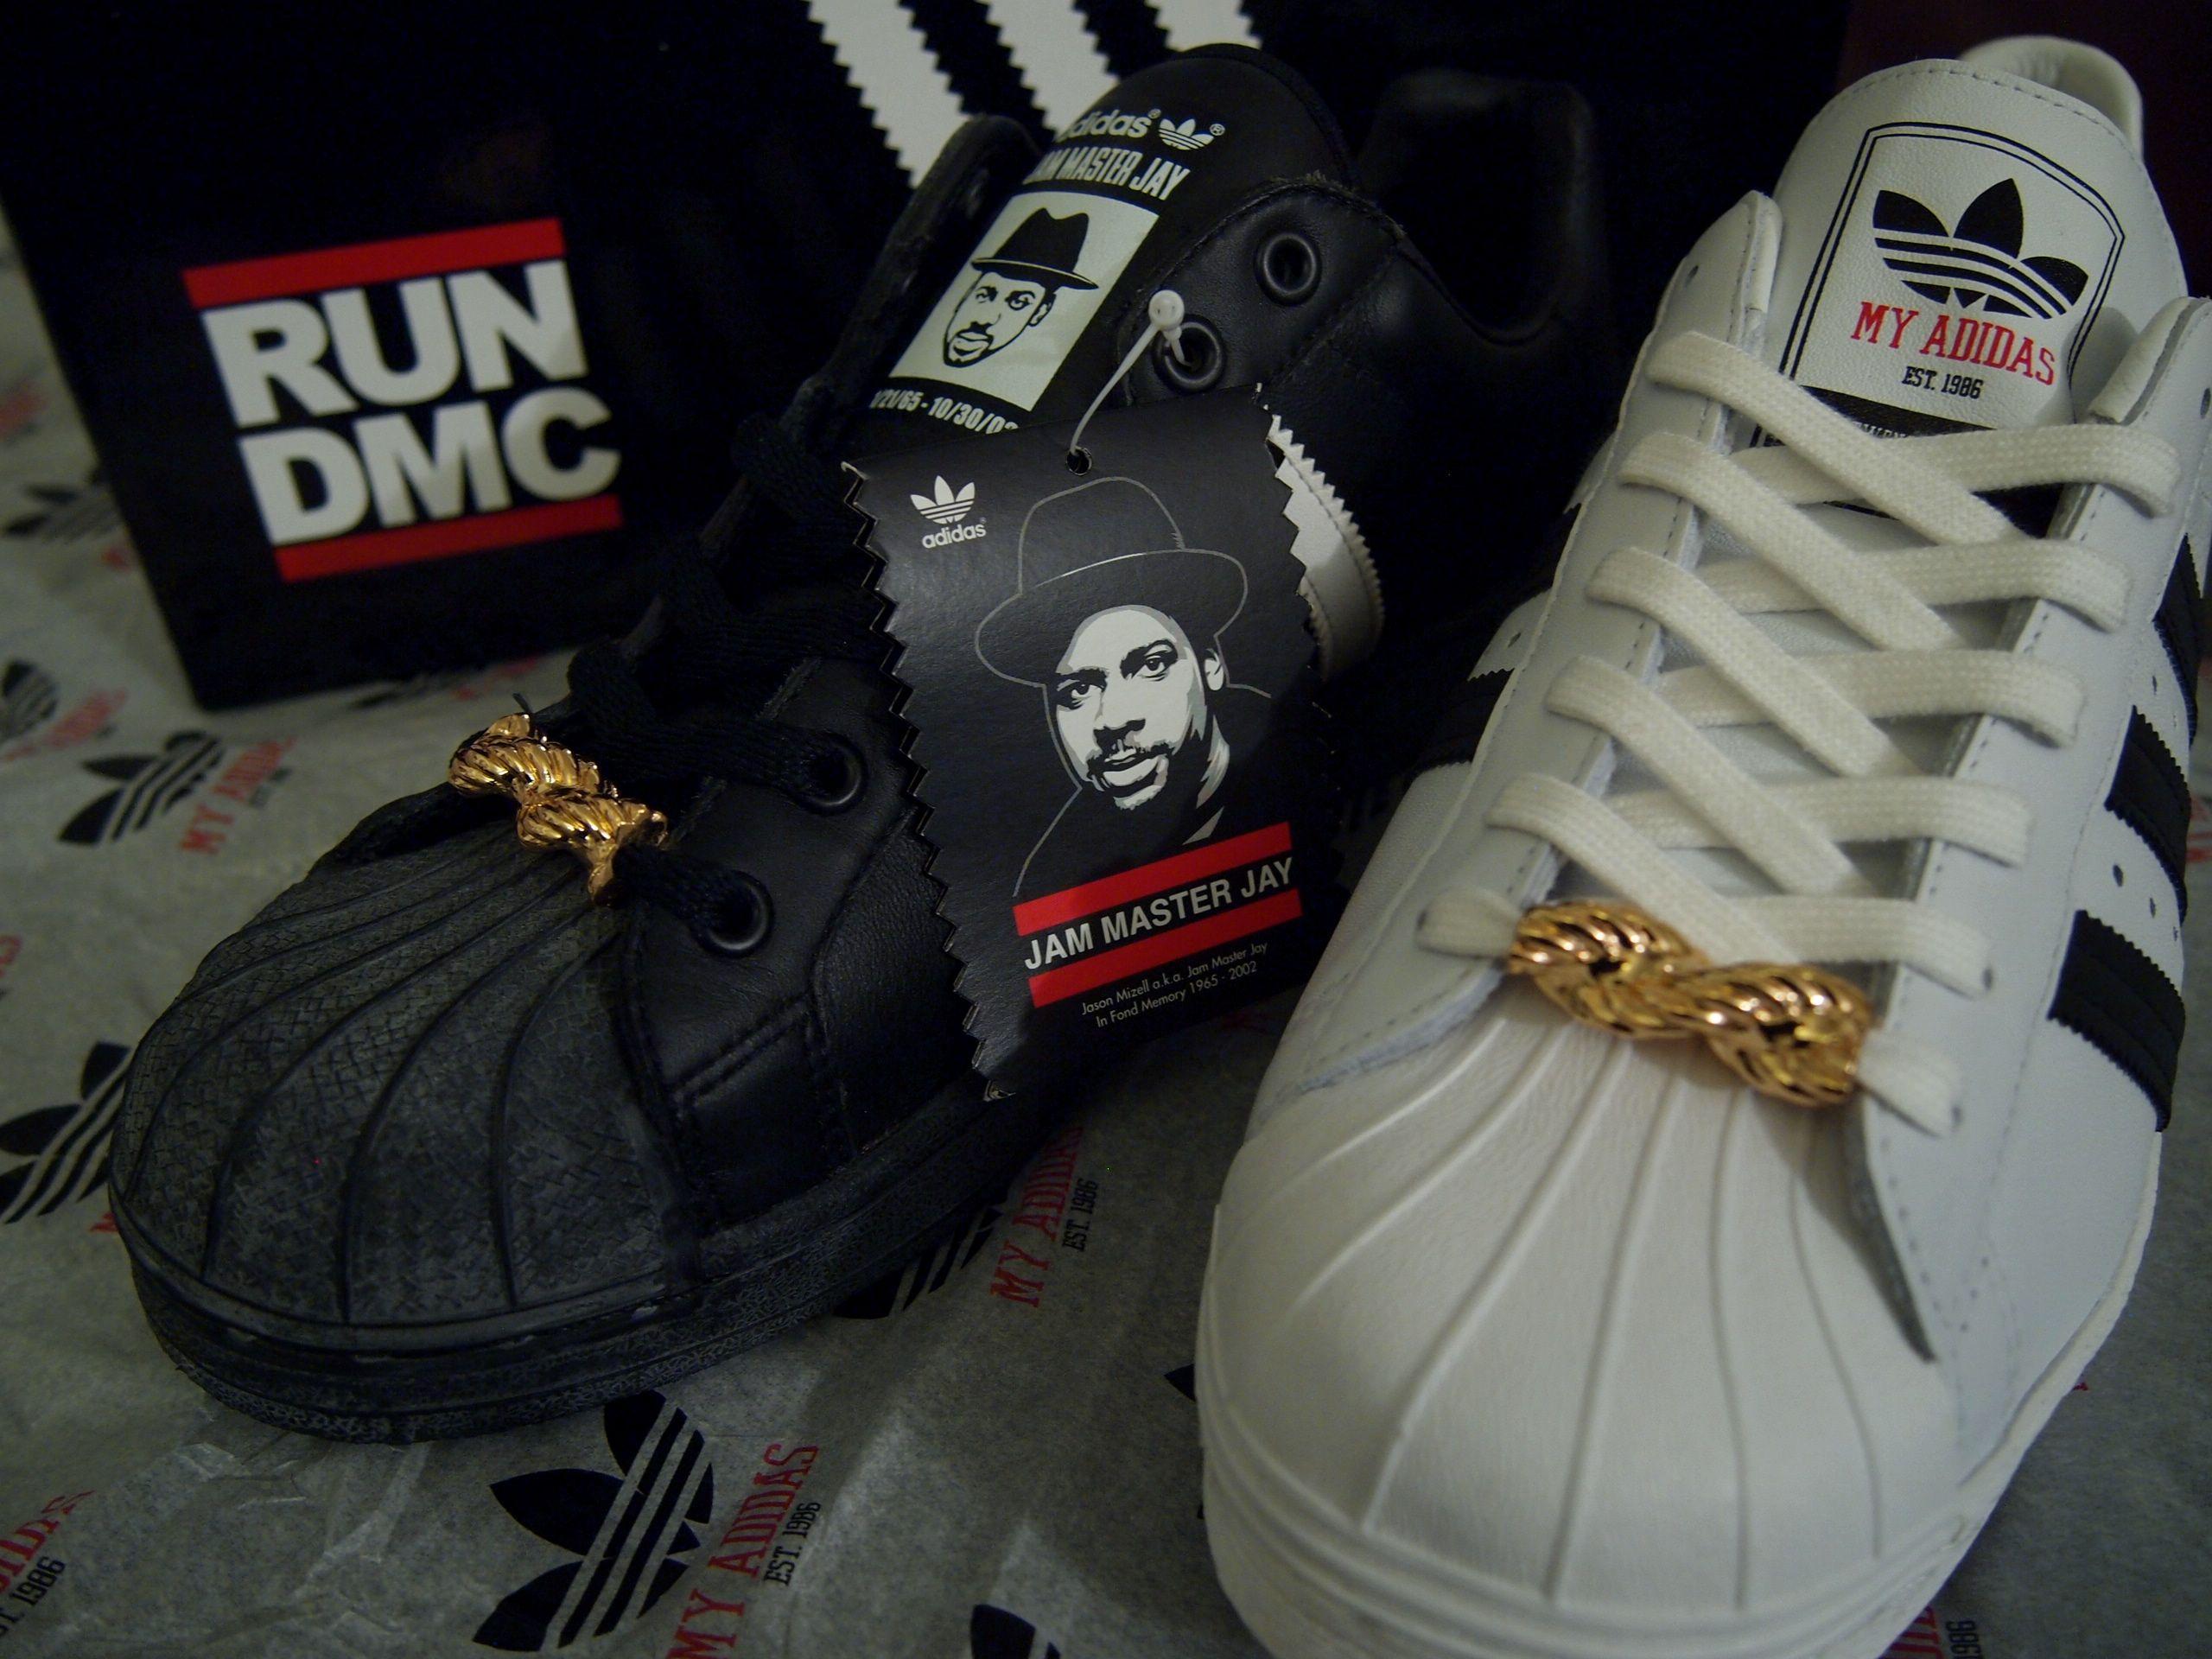 25th anniversary edition Jam Master J(Run Dmc) Adidas Shell Toe